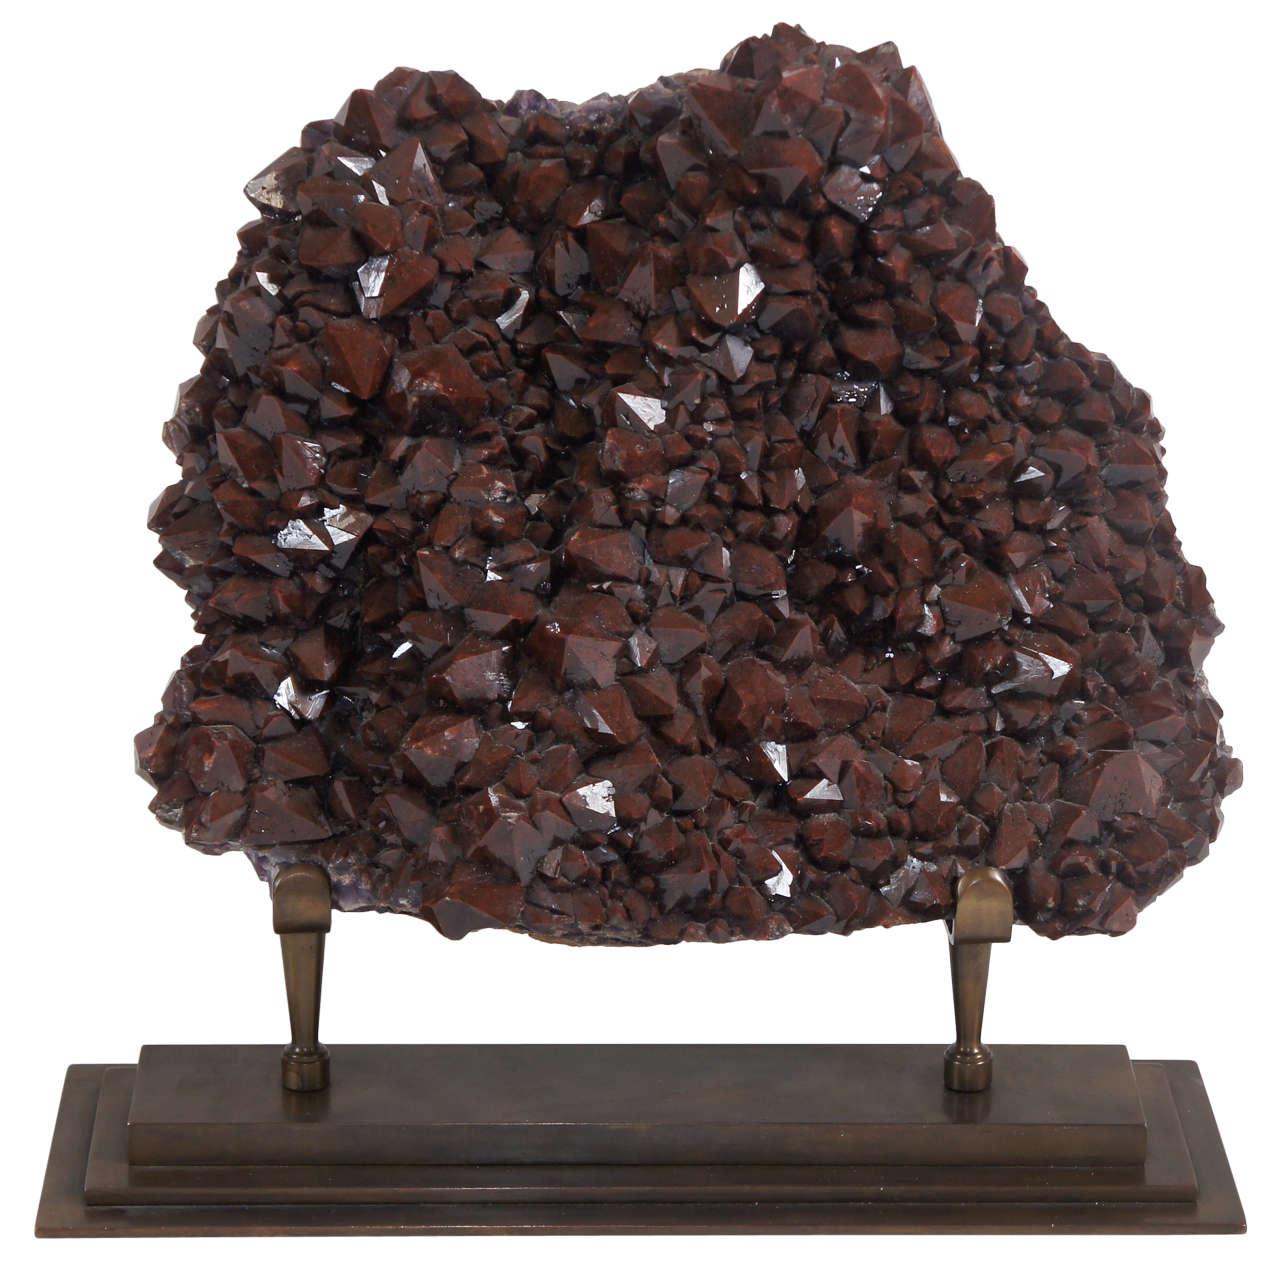 Large Red Cap Amethyst Hematite Specimen on Bronze Stand